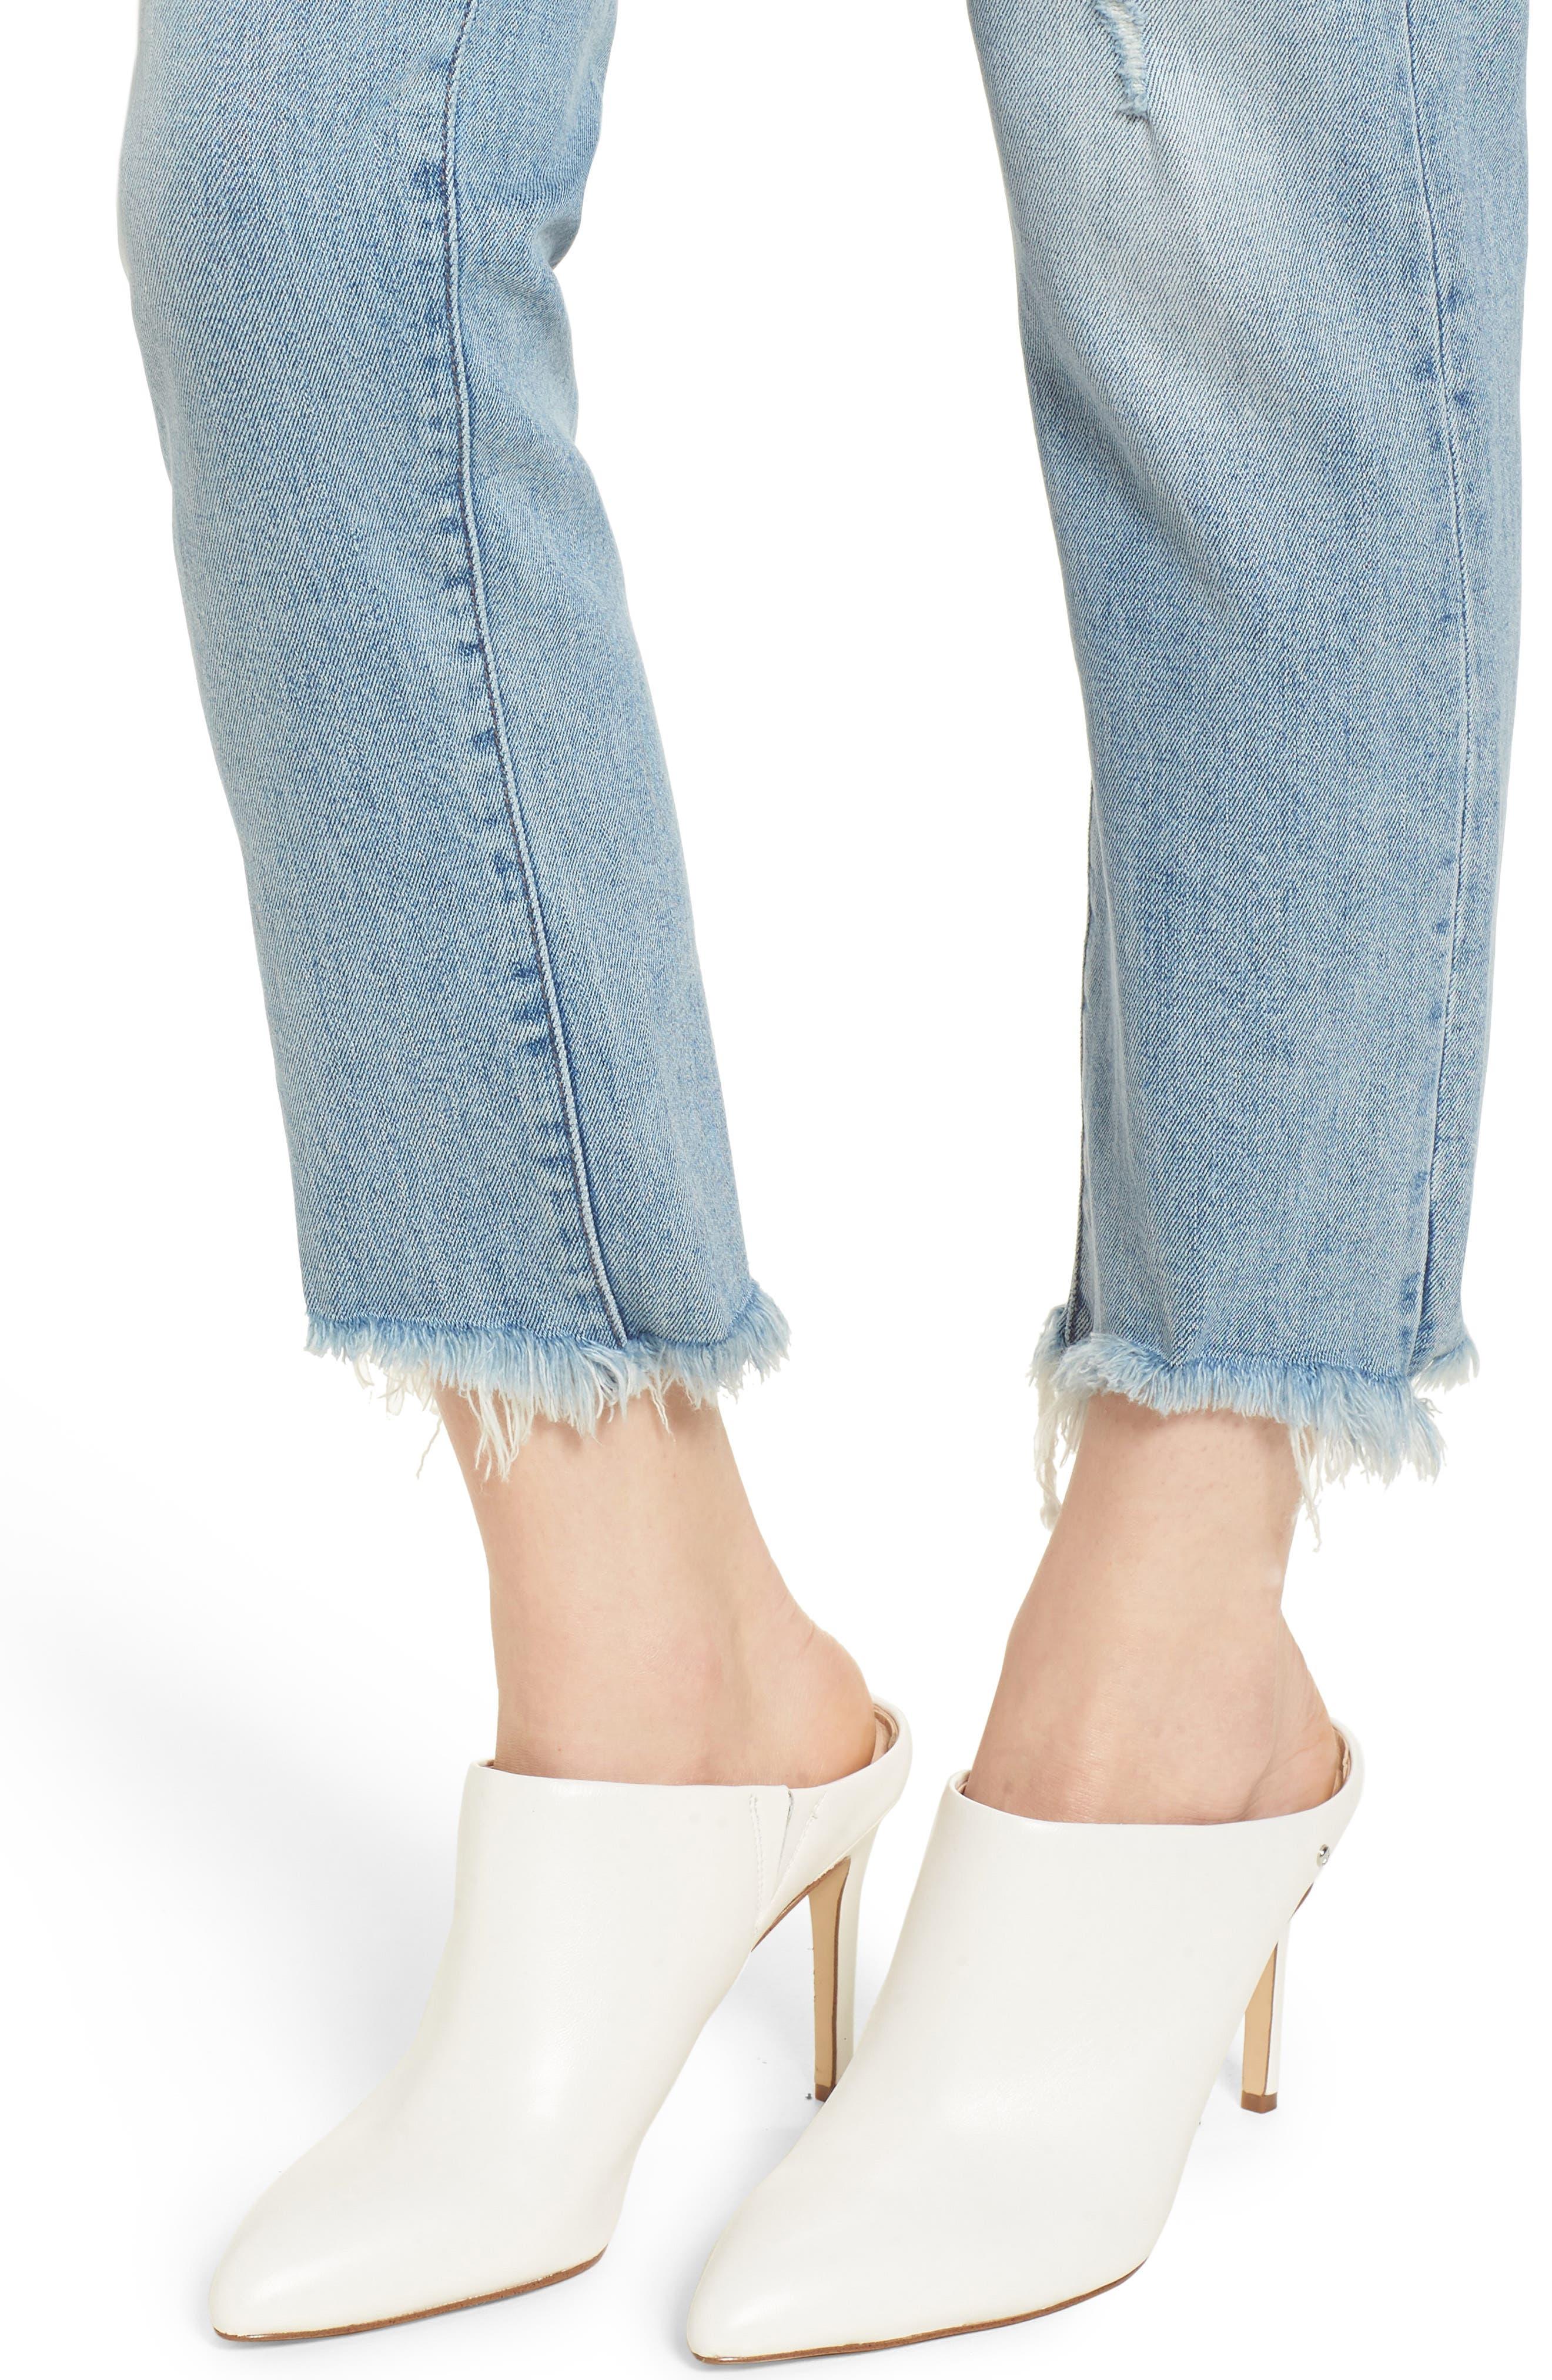 Bella Vintage Crop Slim Jeans,                             Alternate thumbnail 4, color,                             Super Bleach